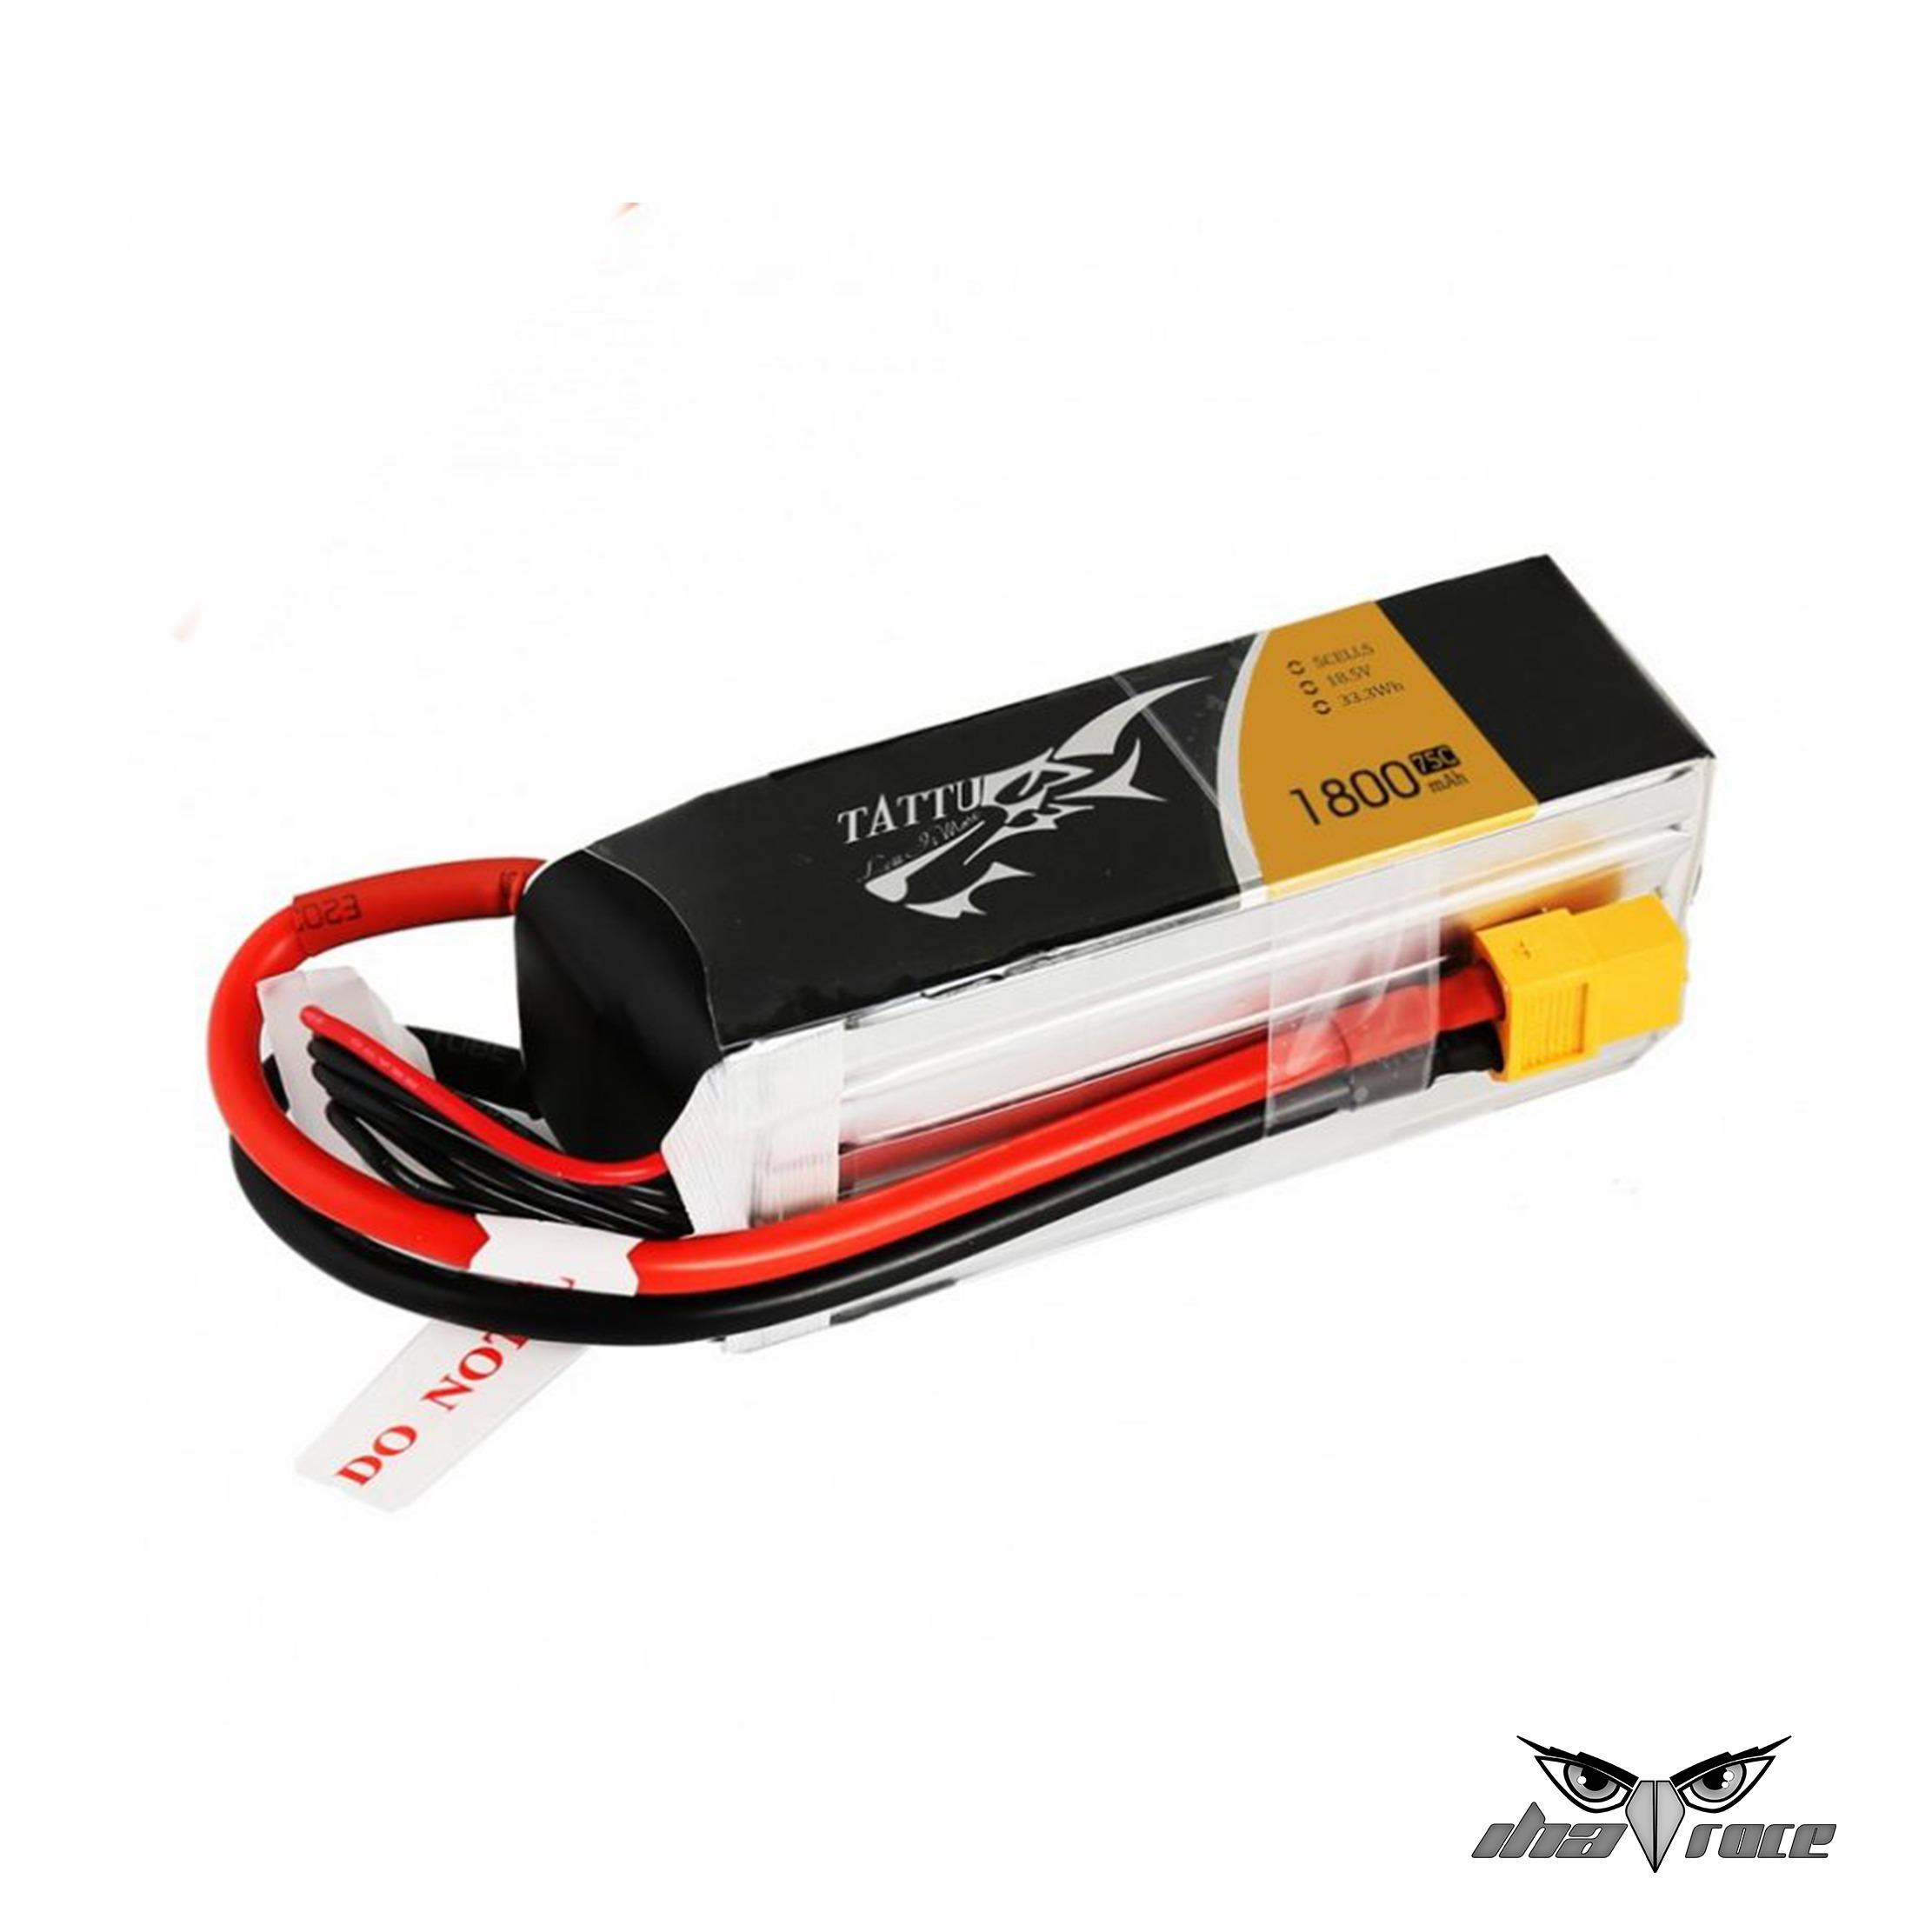 Batería TATTU 5S 1800mAh 75C 18.5V XT60 comprar barato